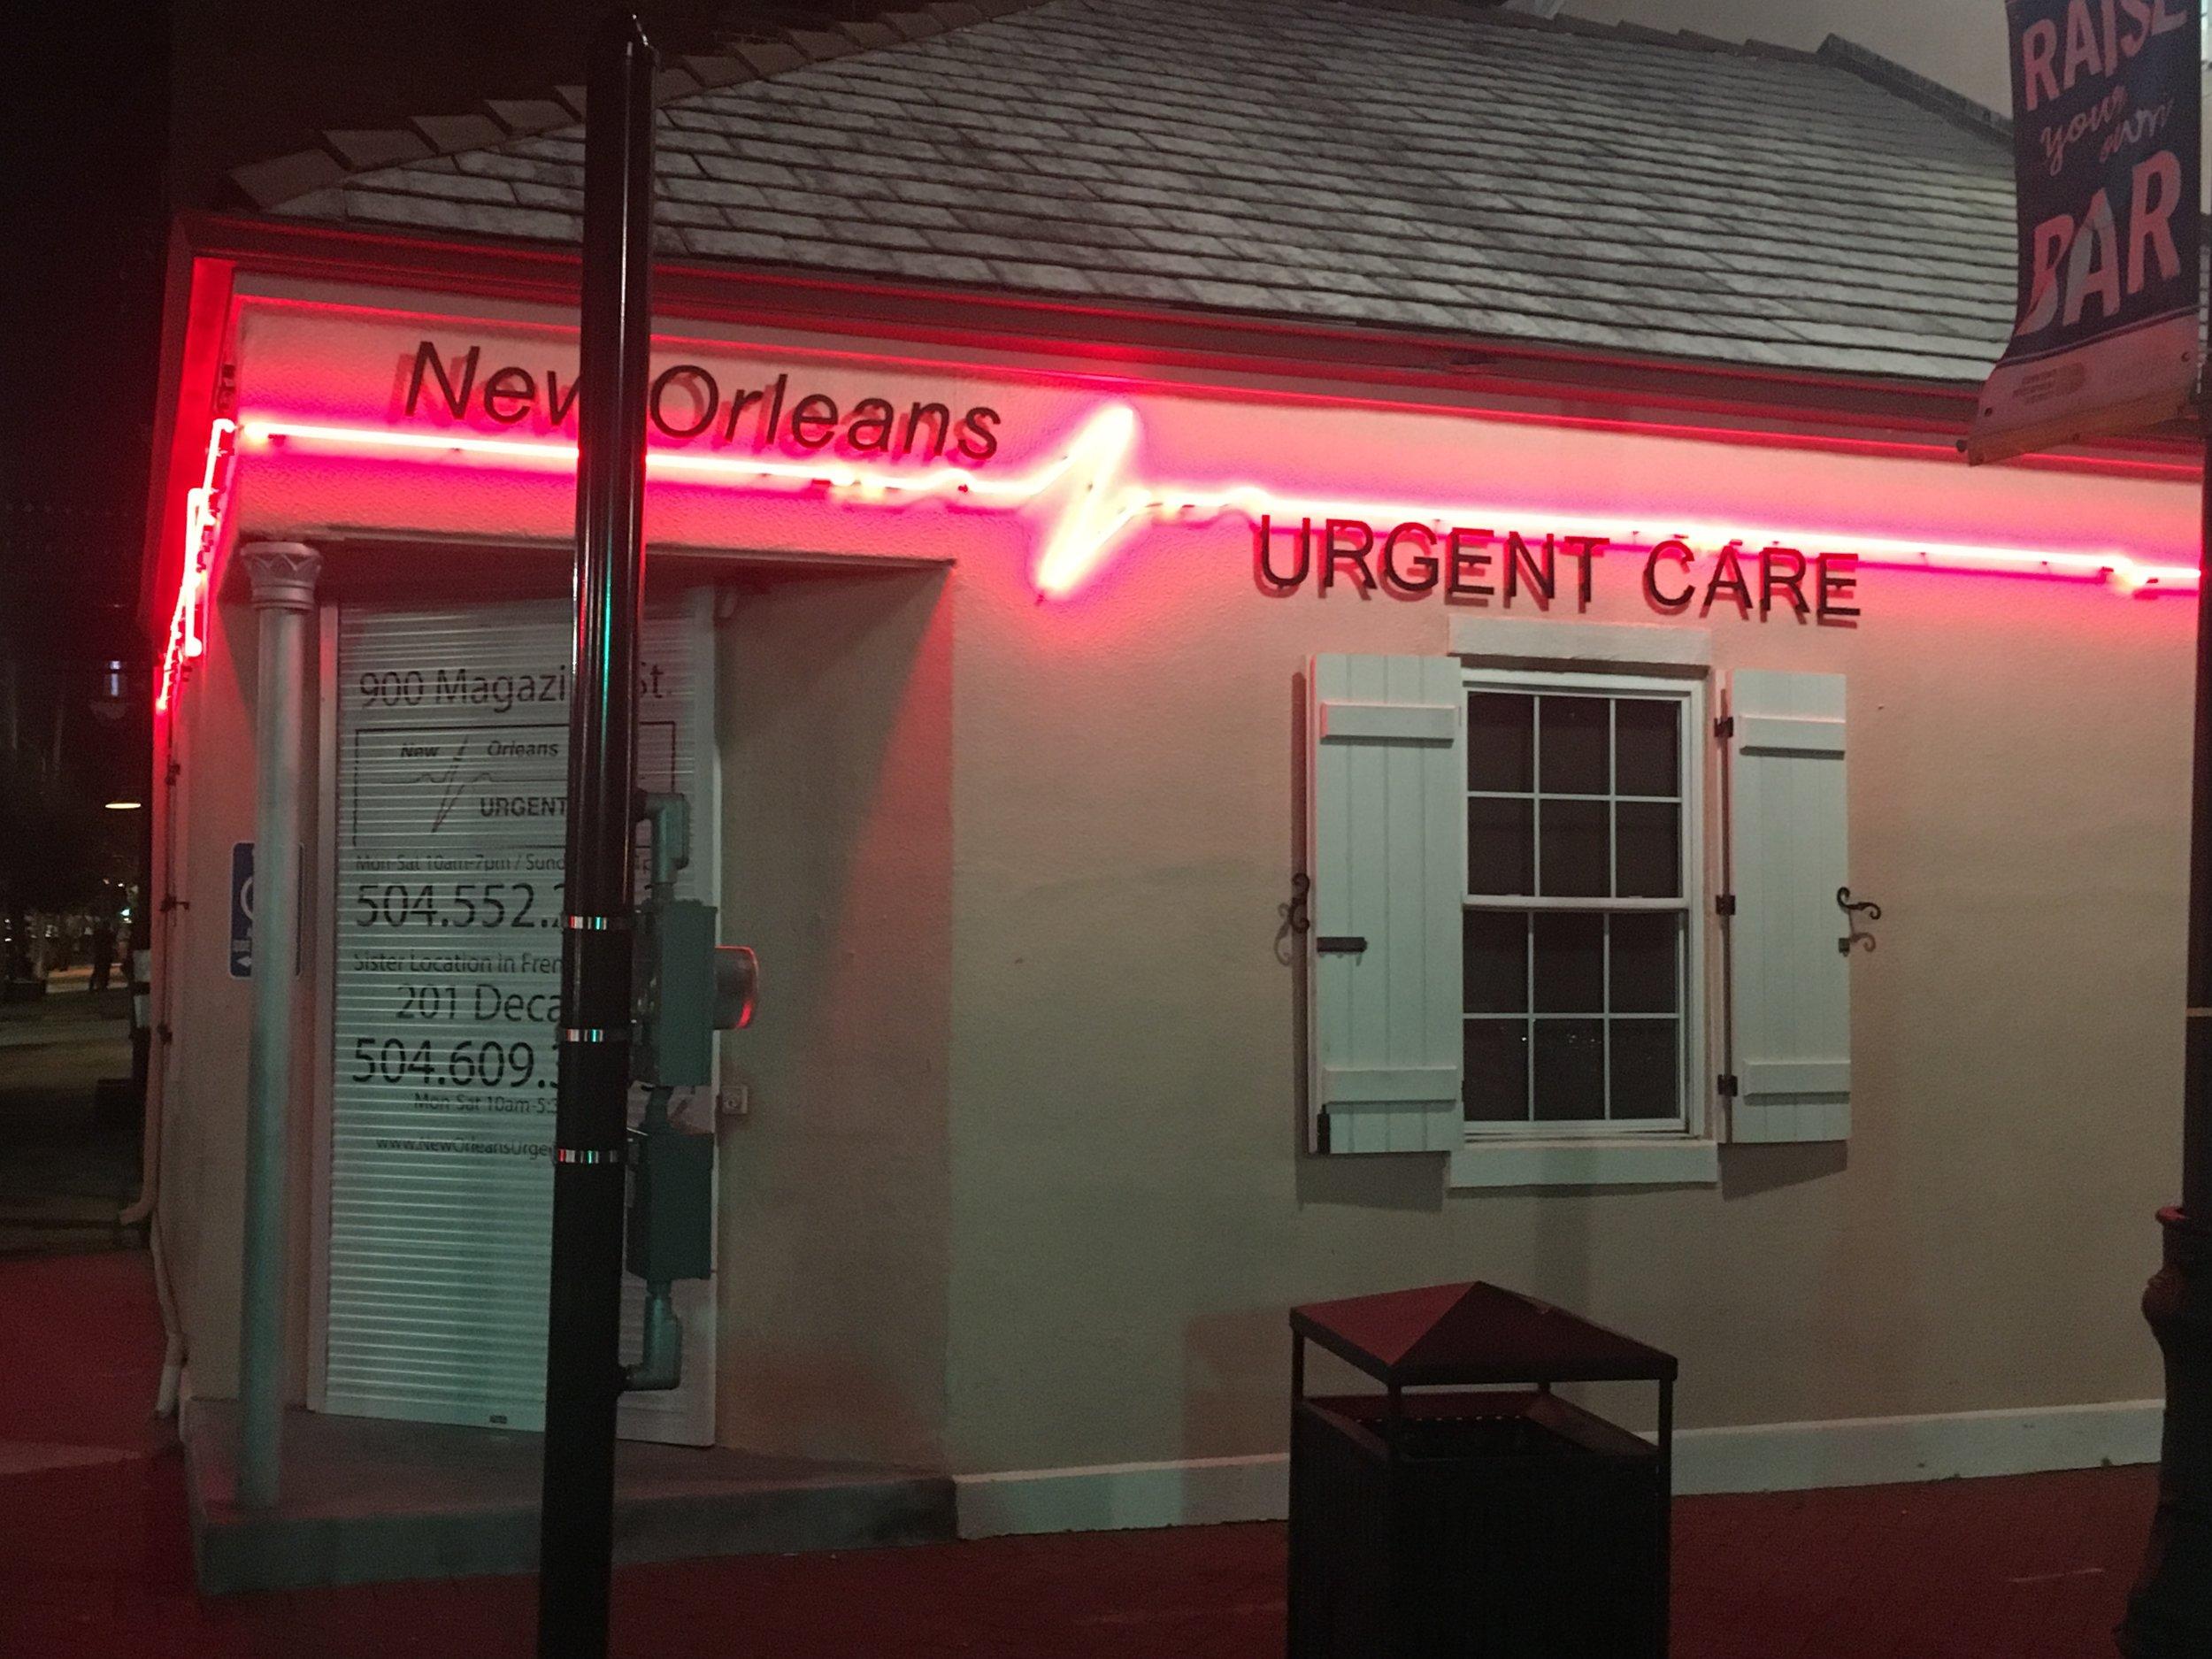 Good Neon: No one needed urgent care.